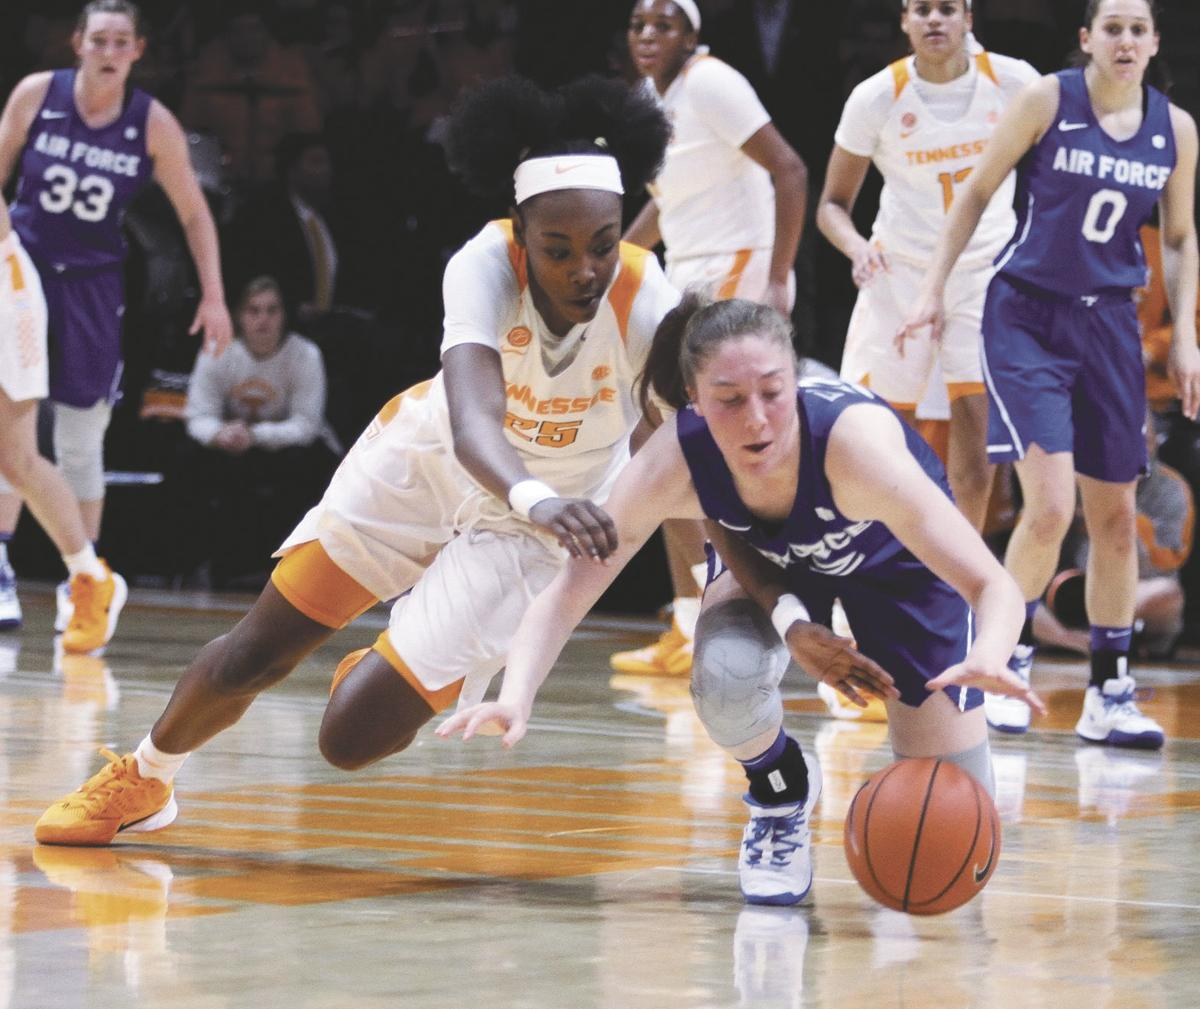 BASKETBALL: Tennessee's Jordan Horston vs. Air Force